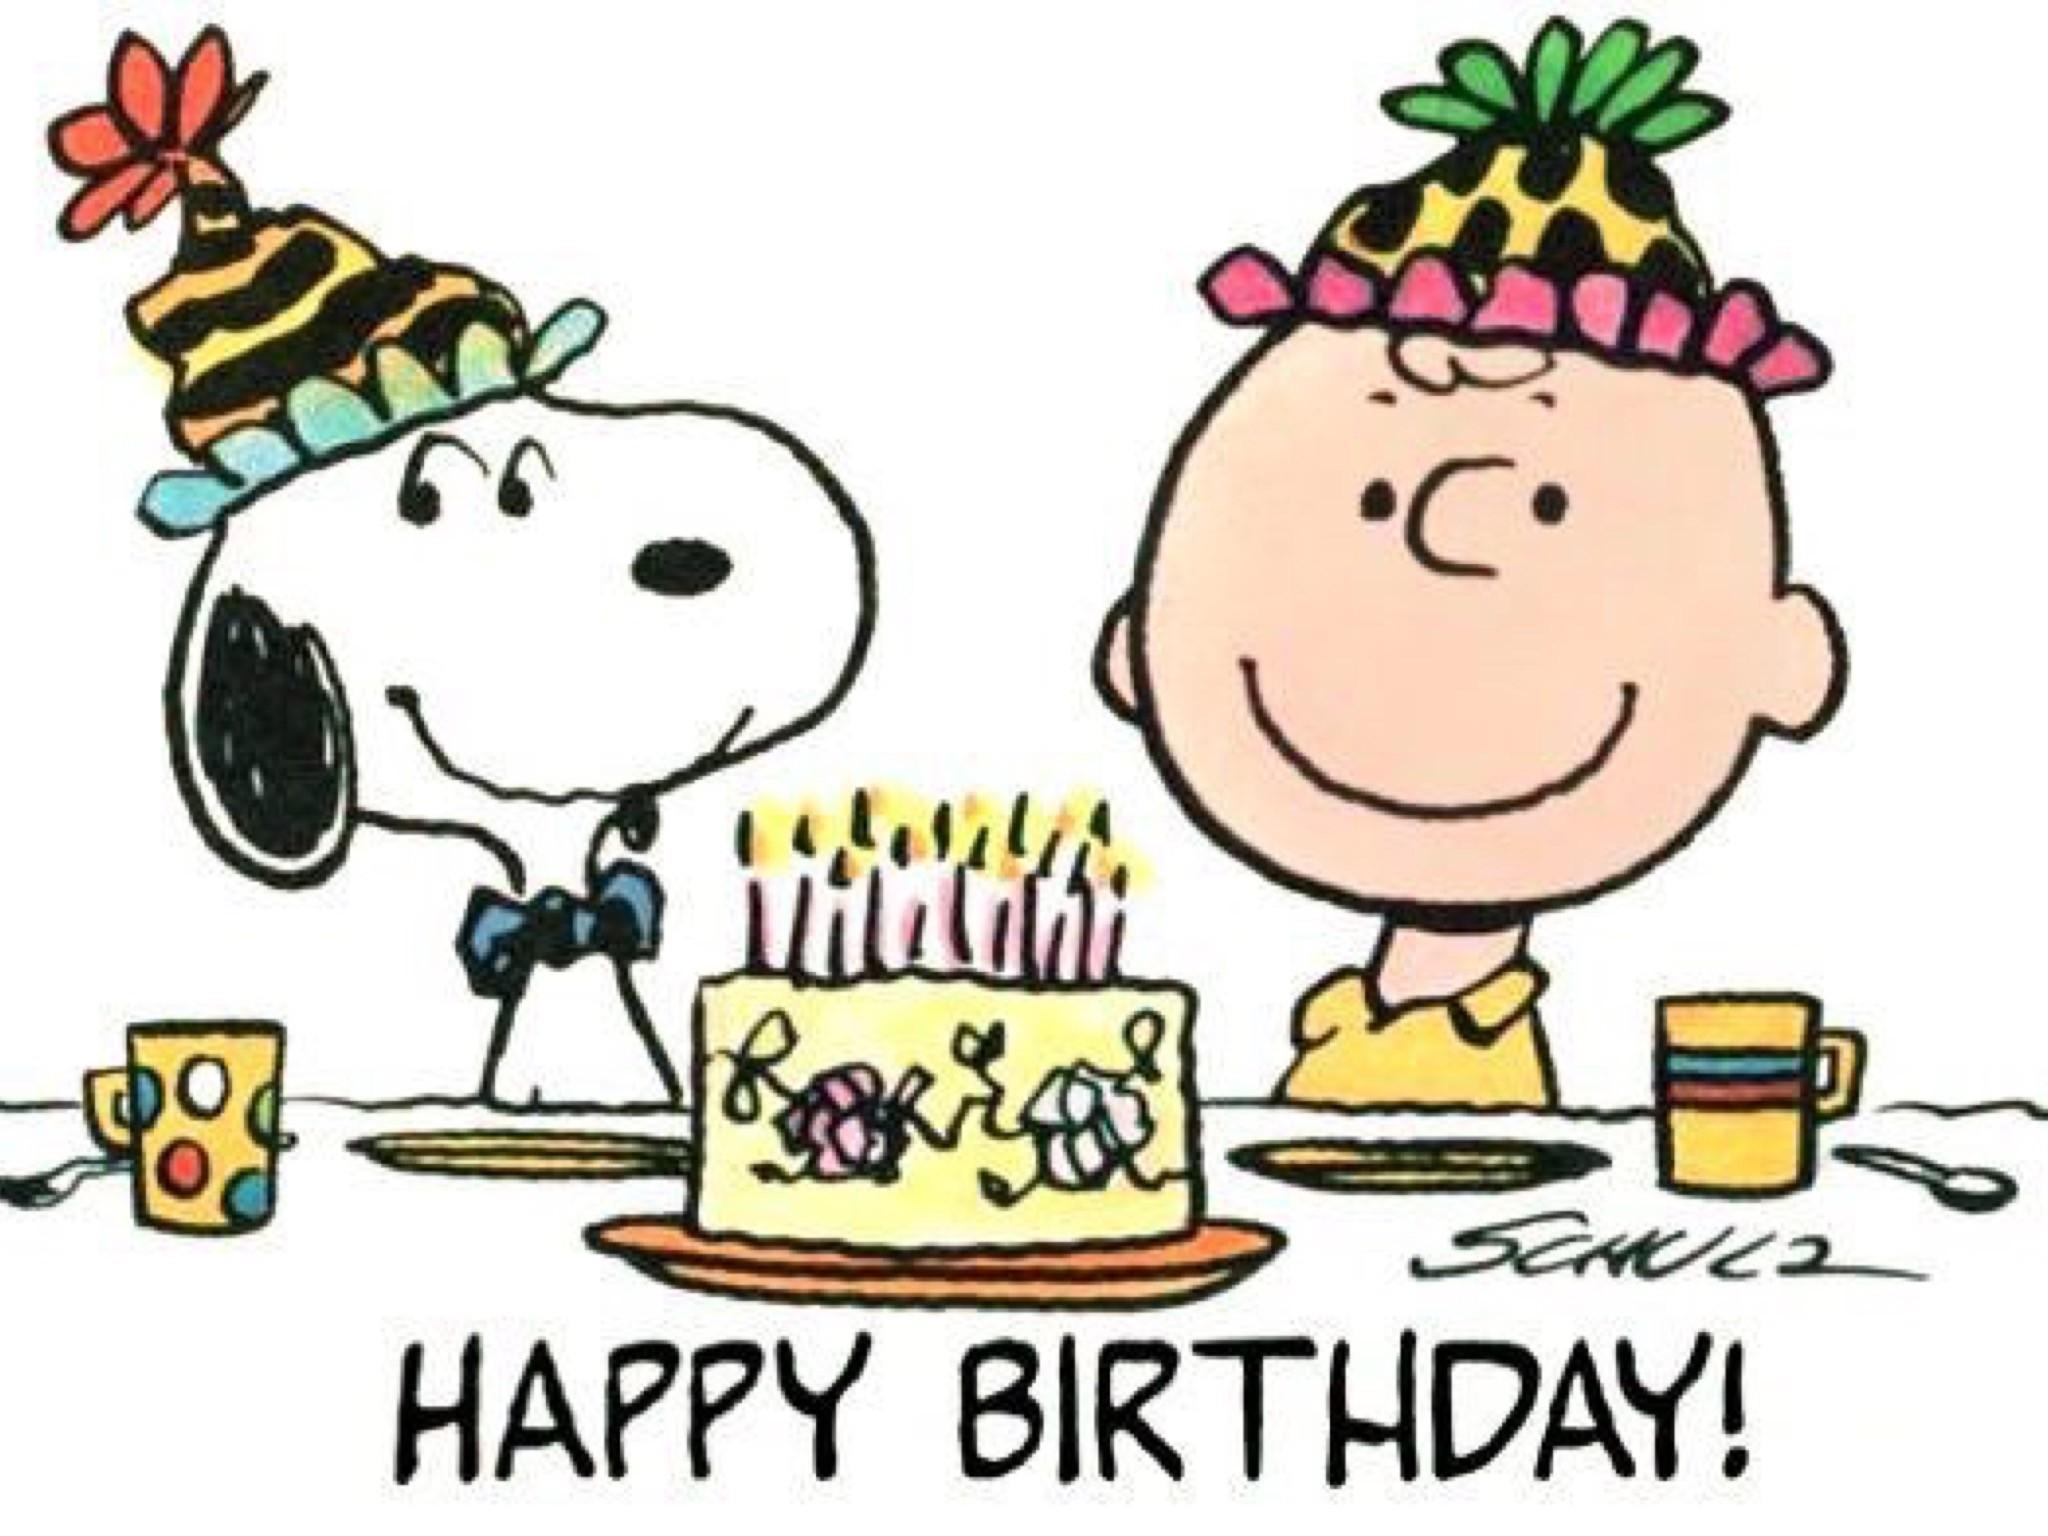 Happy Birthday Charlie Brown